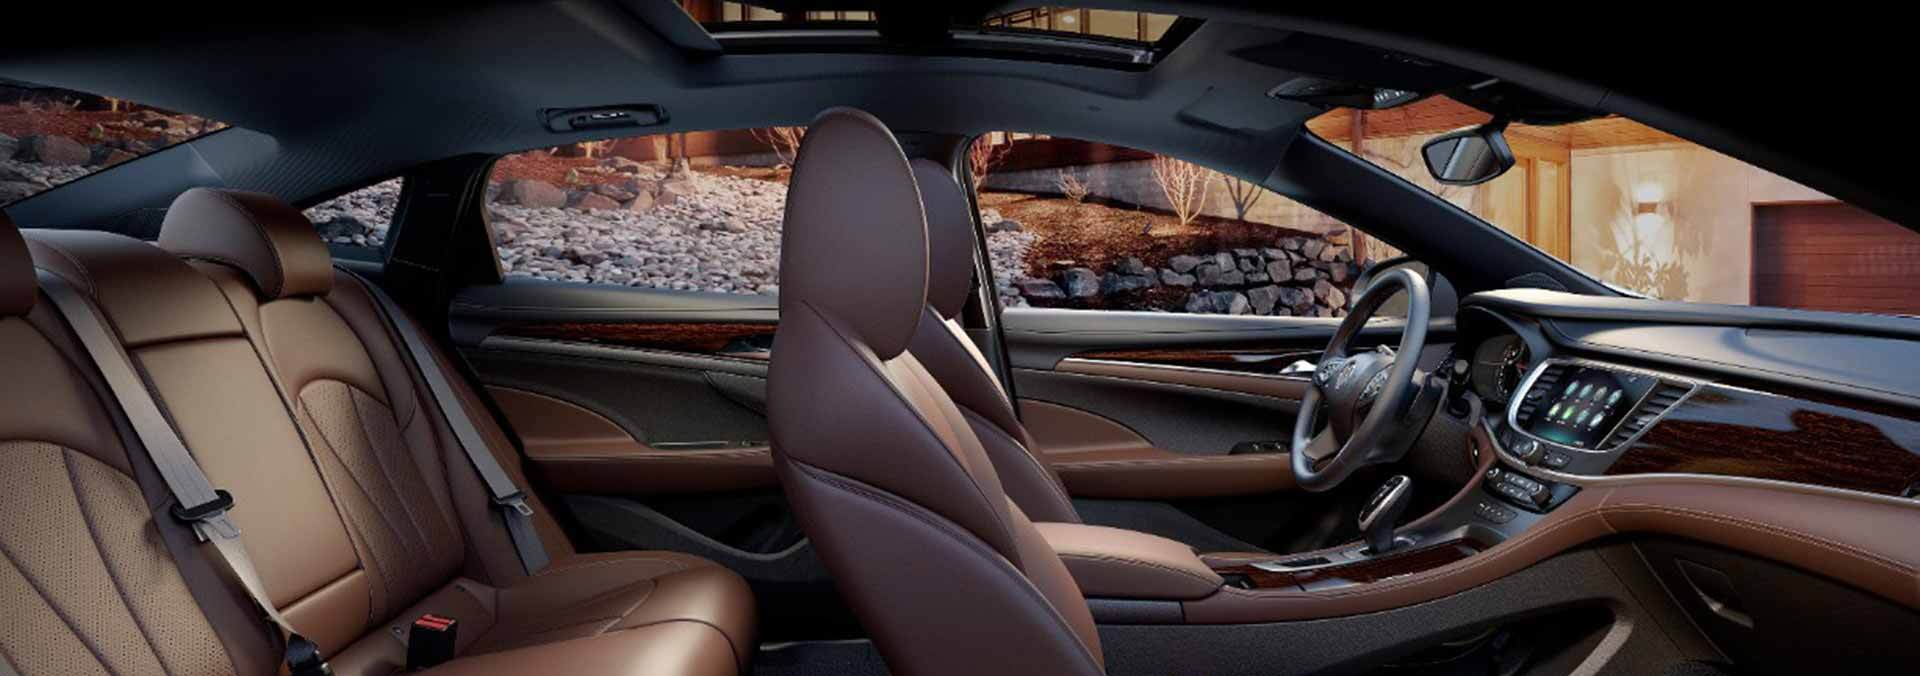 2018 Buick Lacrosse Interior